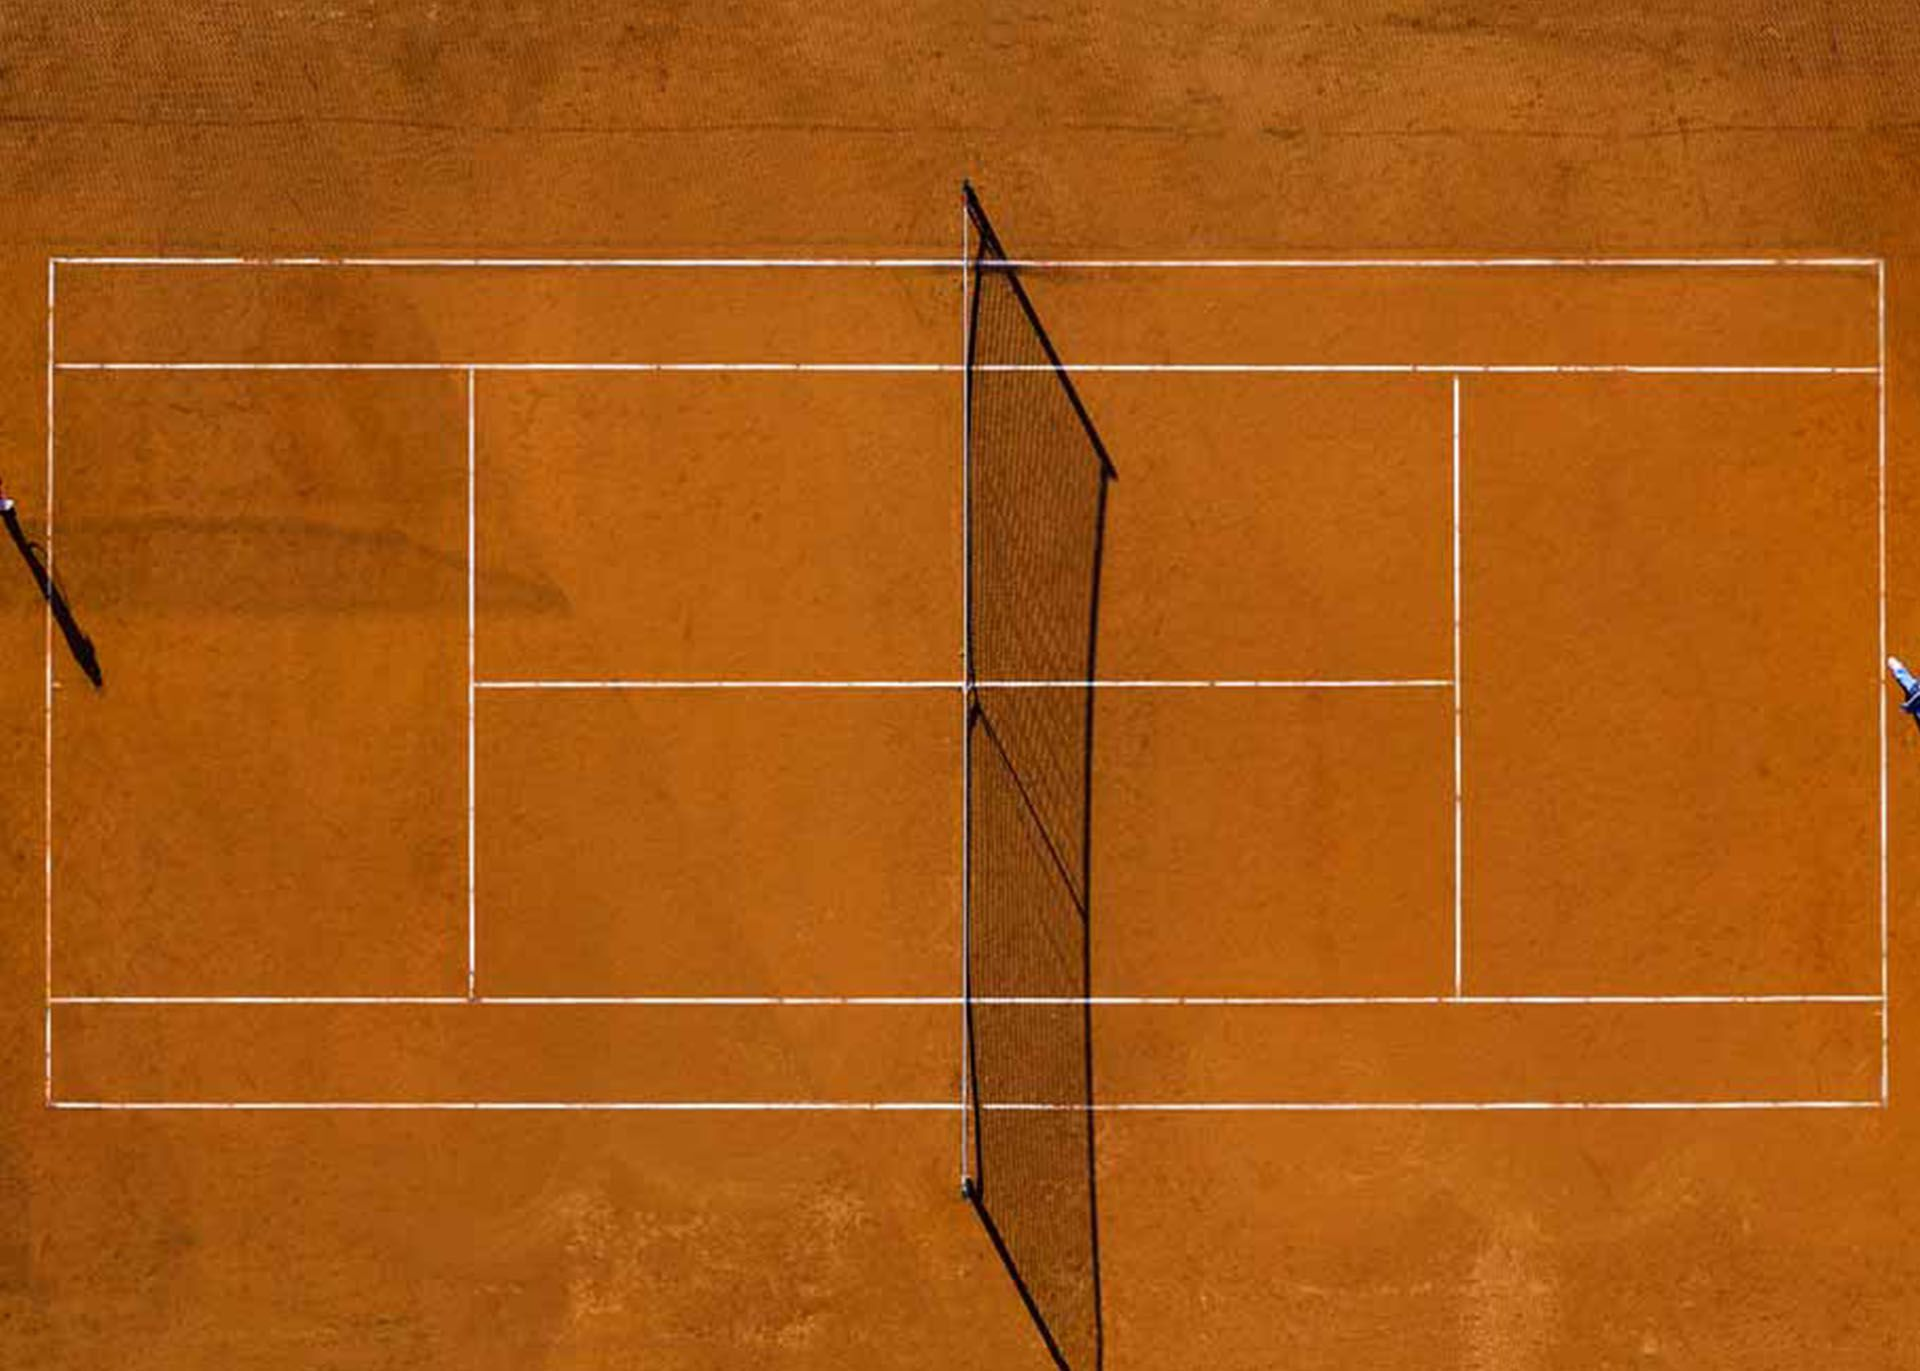 Clay Court Tennis (Har Tru)